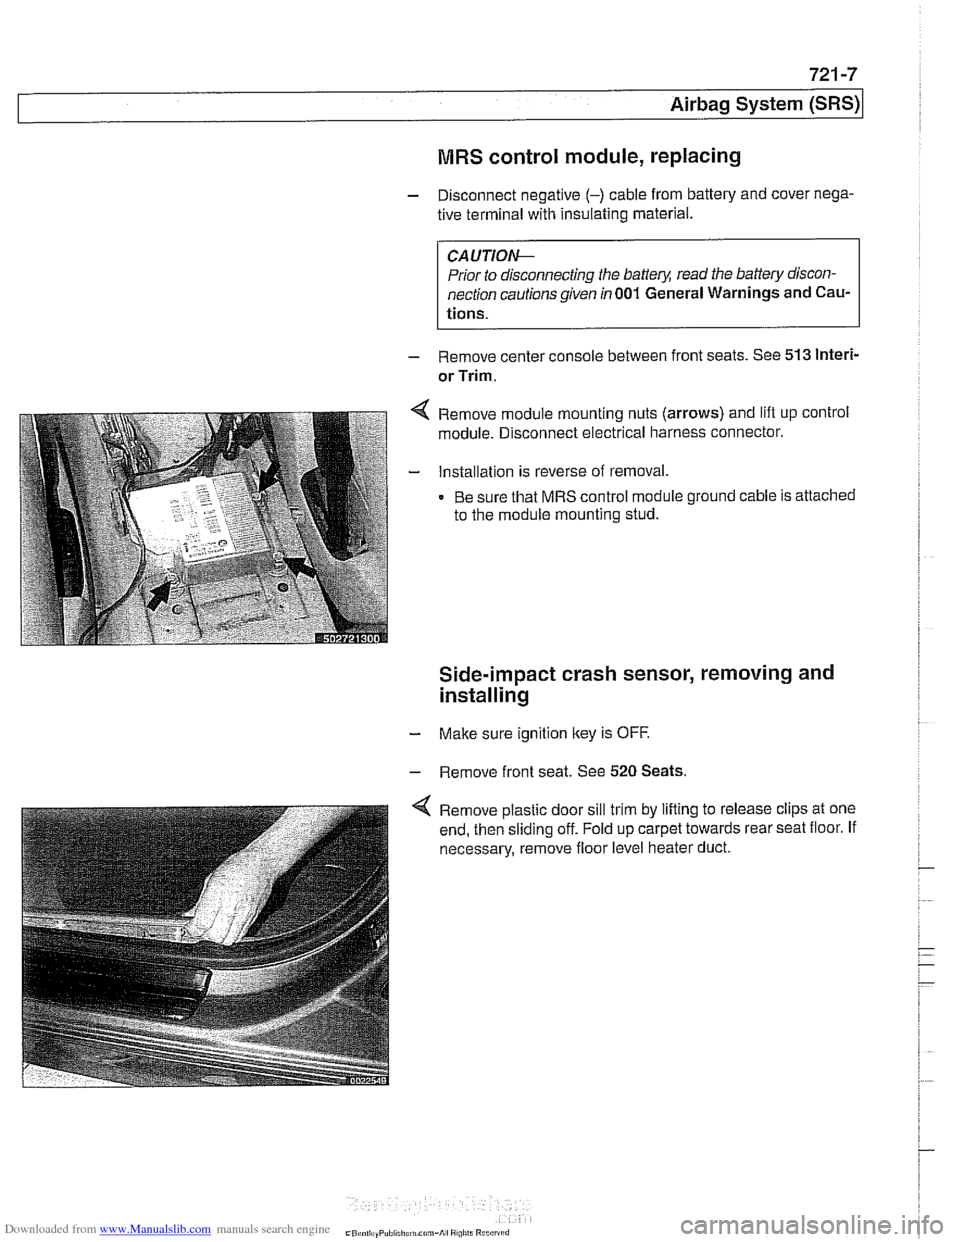 Engine Bmw 530i 2001 E39 Workshop Manual Module Wiring Diagram Page 955